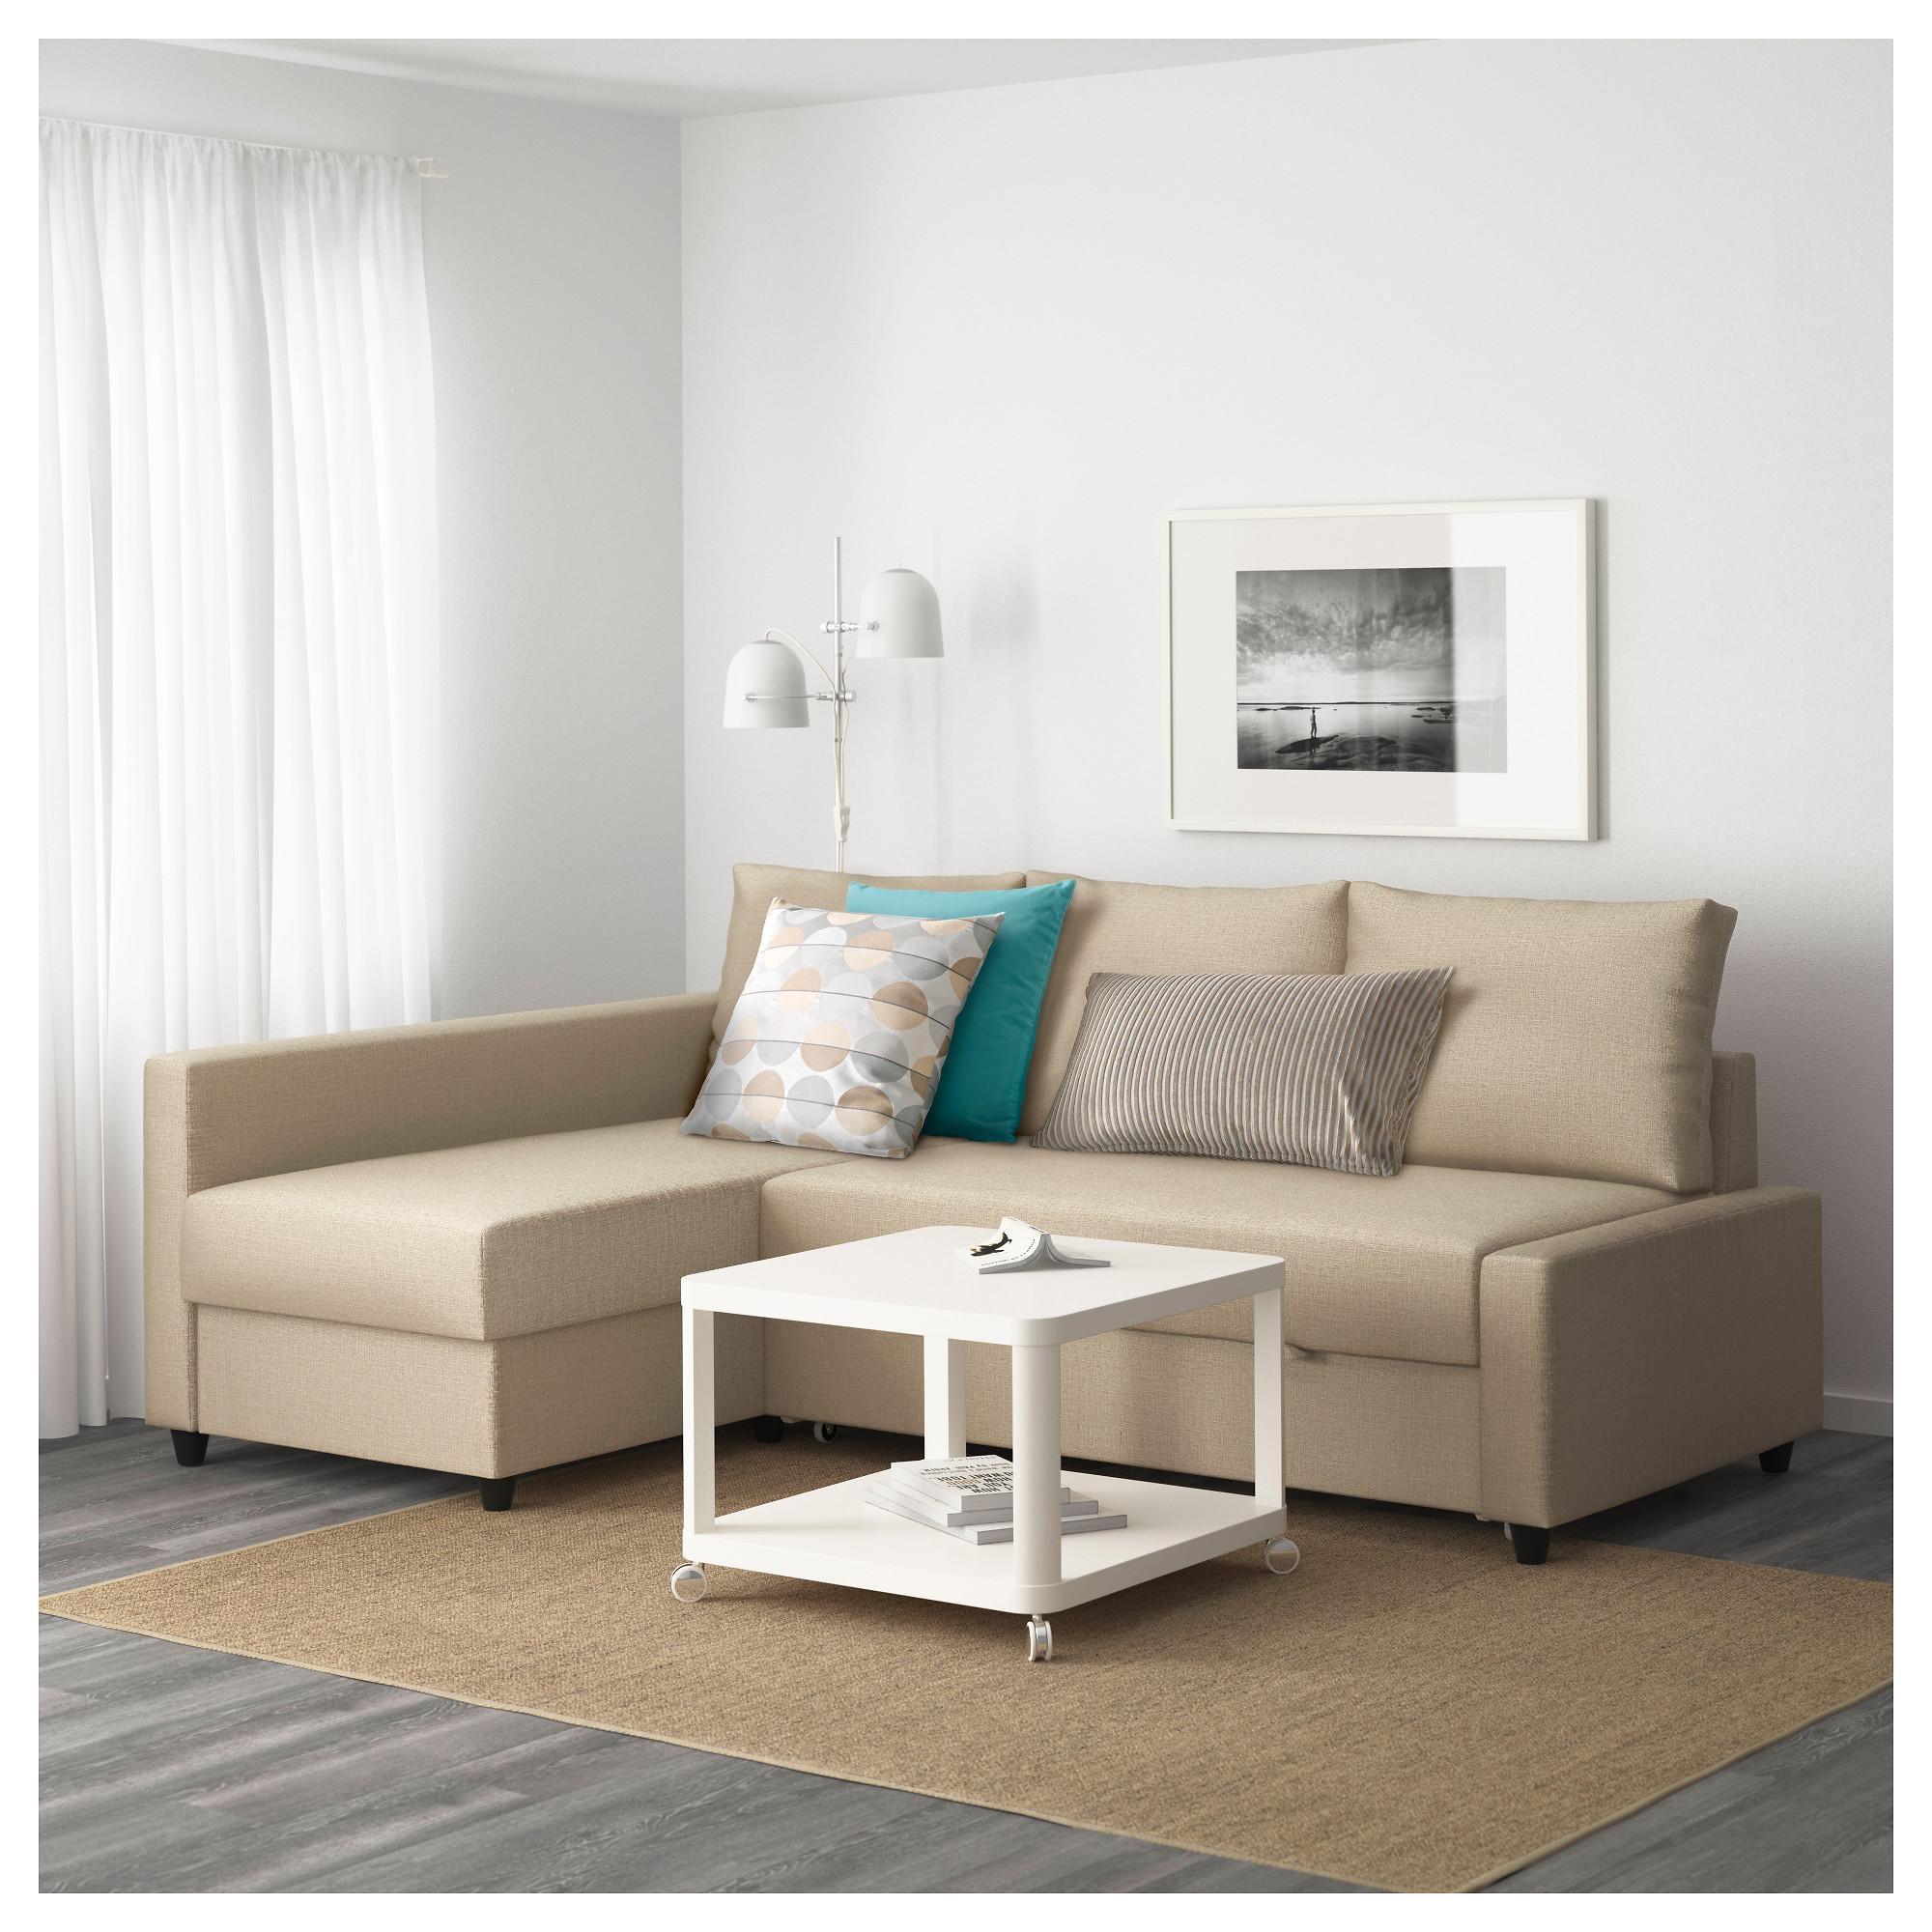 friheten corner sofa bed skiftebo beige elegant sets designs 20 ideas of storage sofas ikea